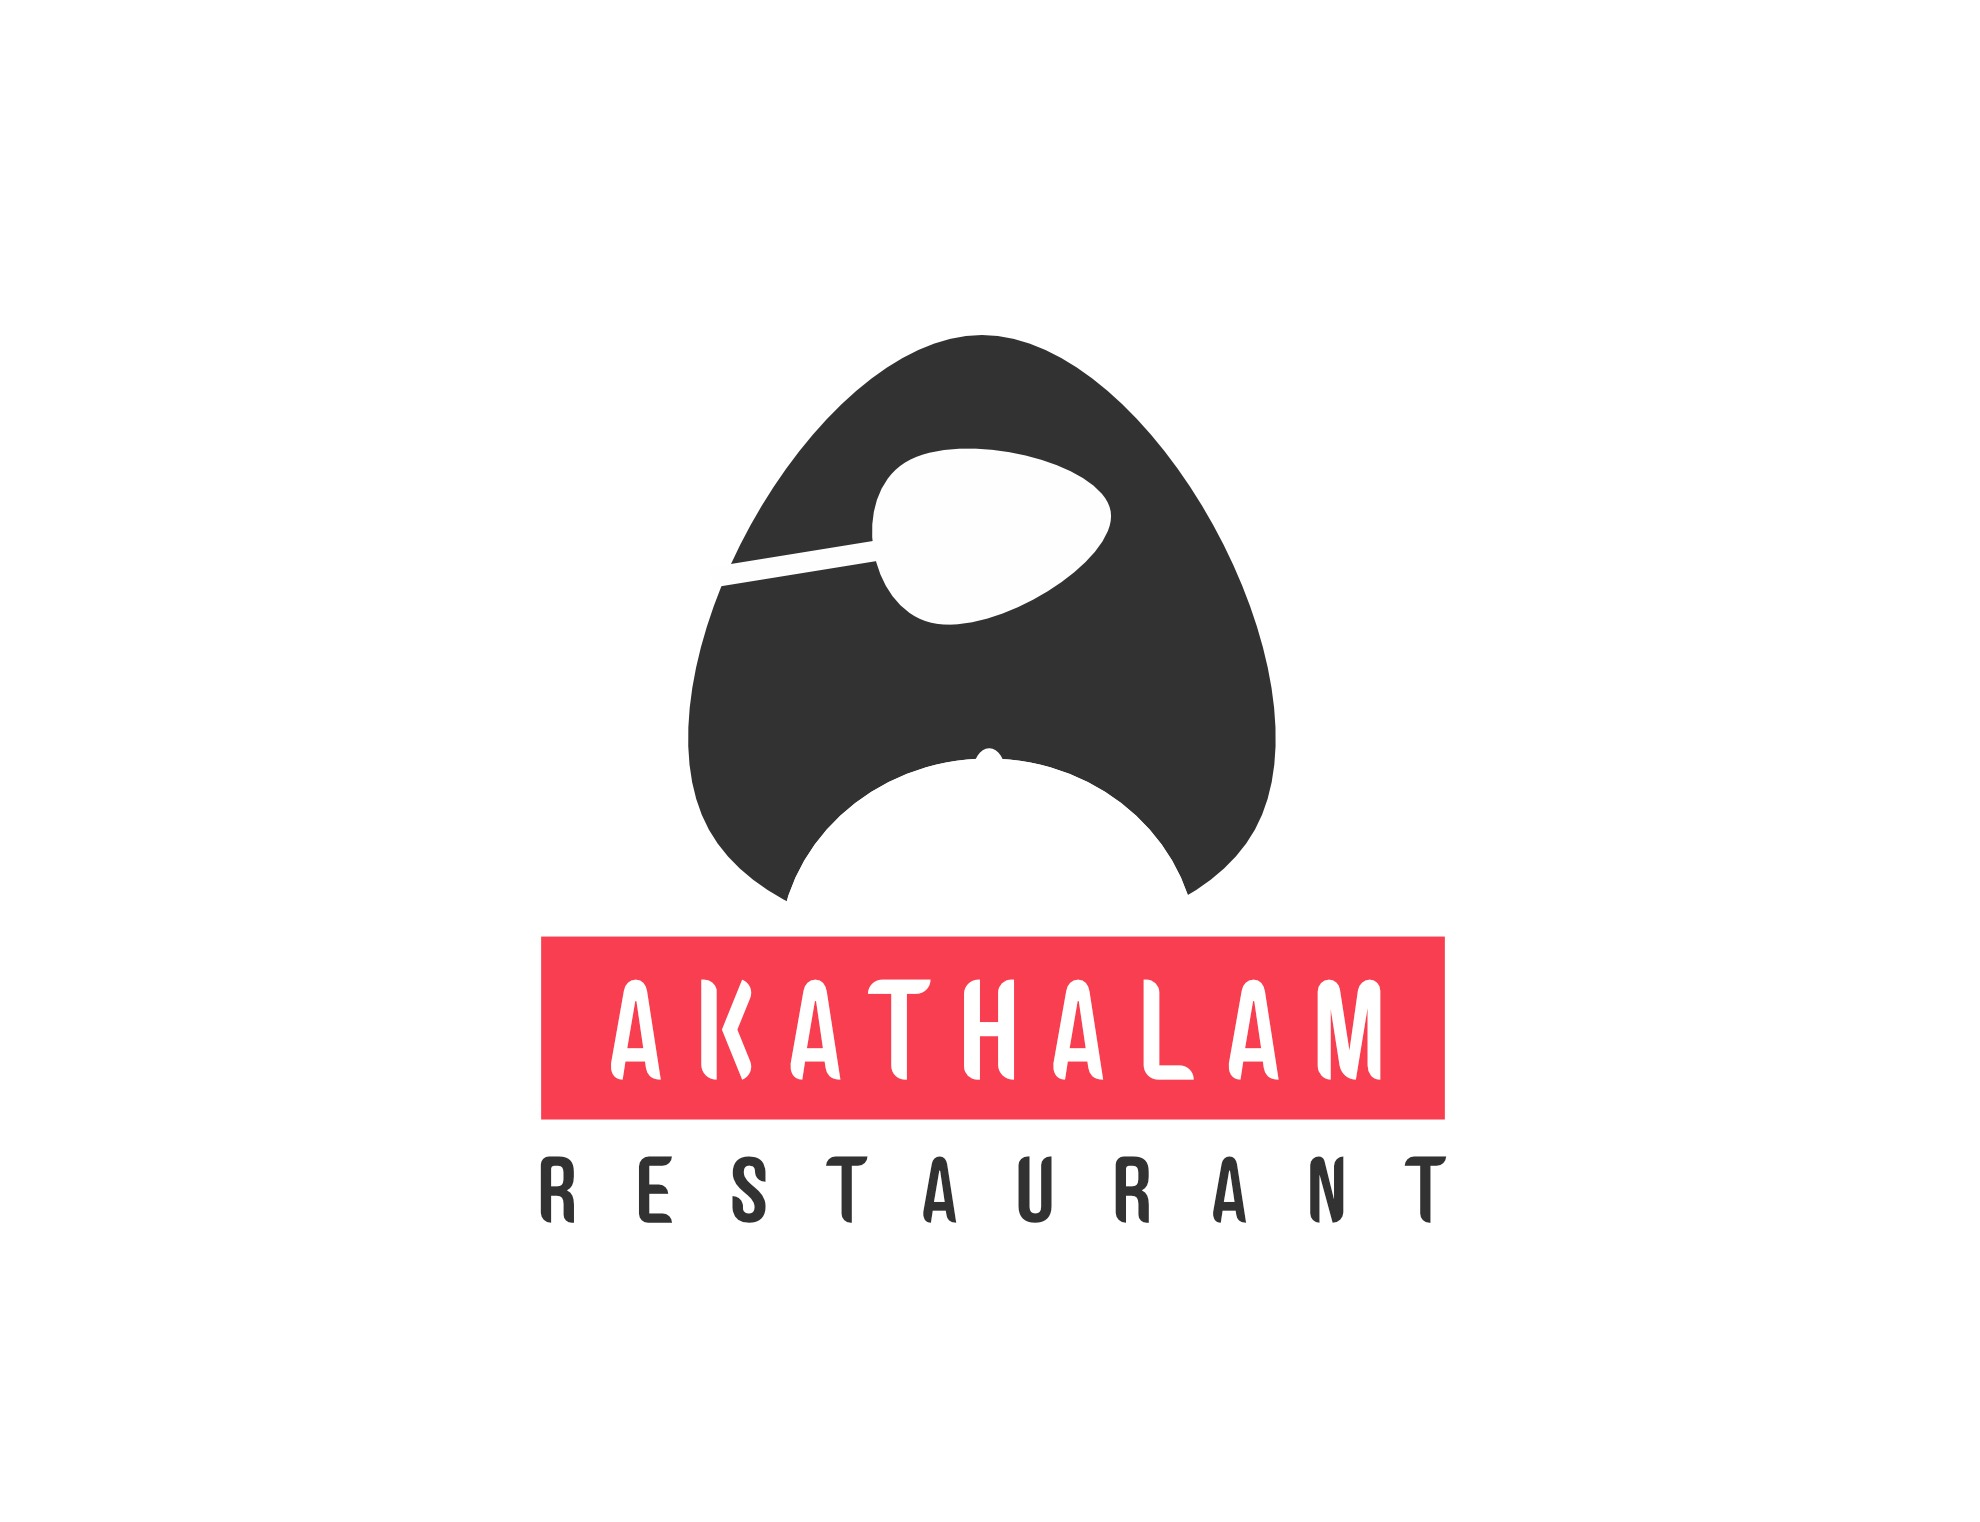 /var/www/html/wp-content/uploads/2018/09/akathalam7